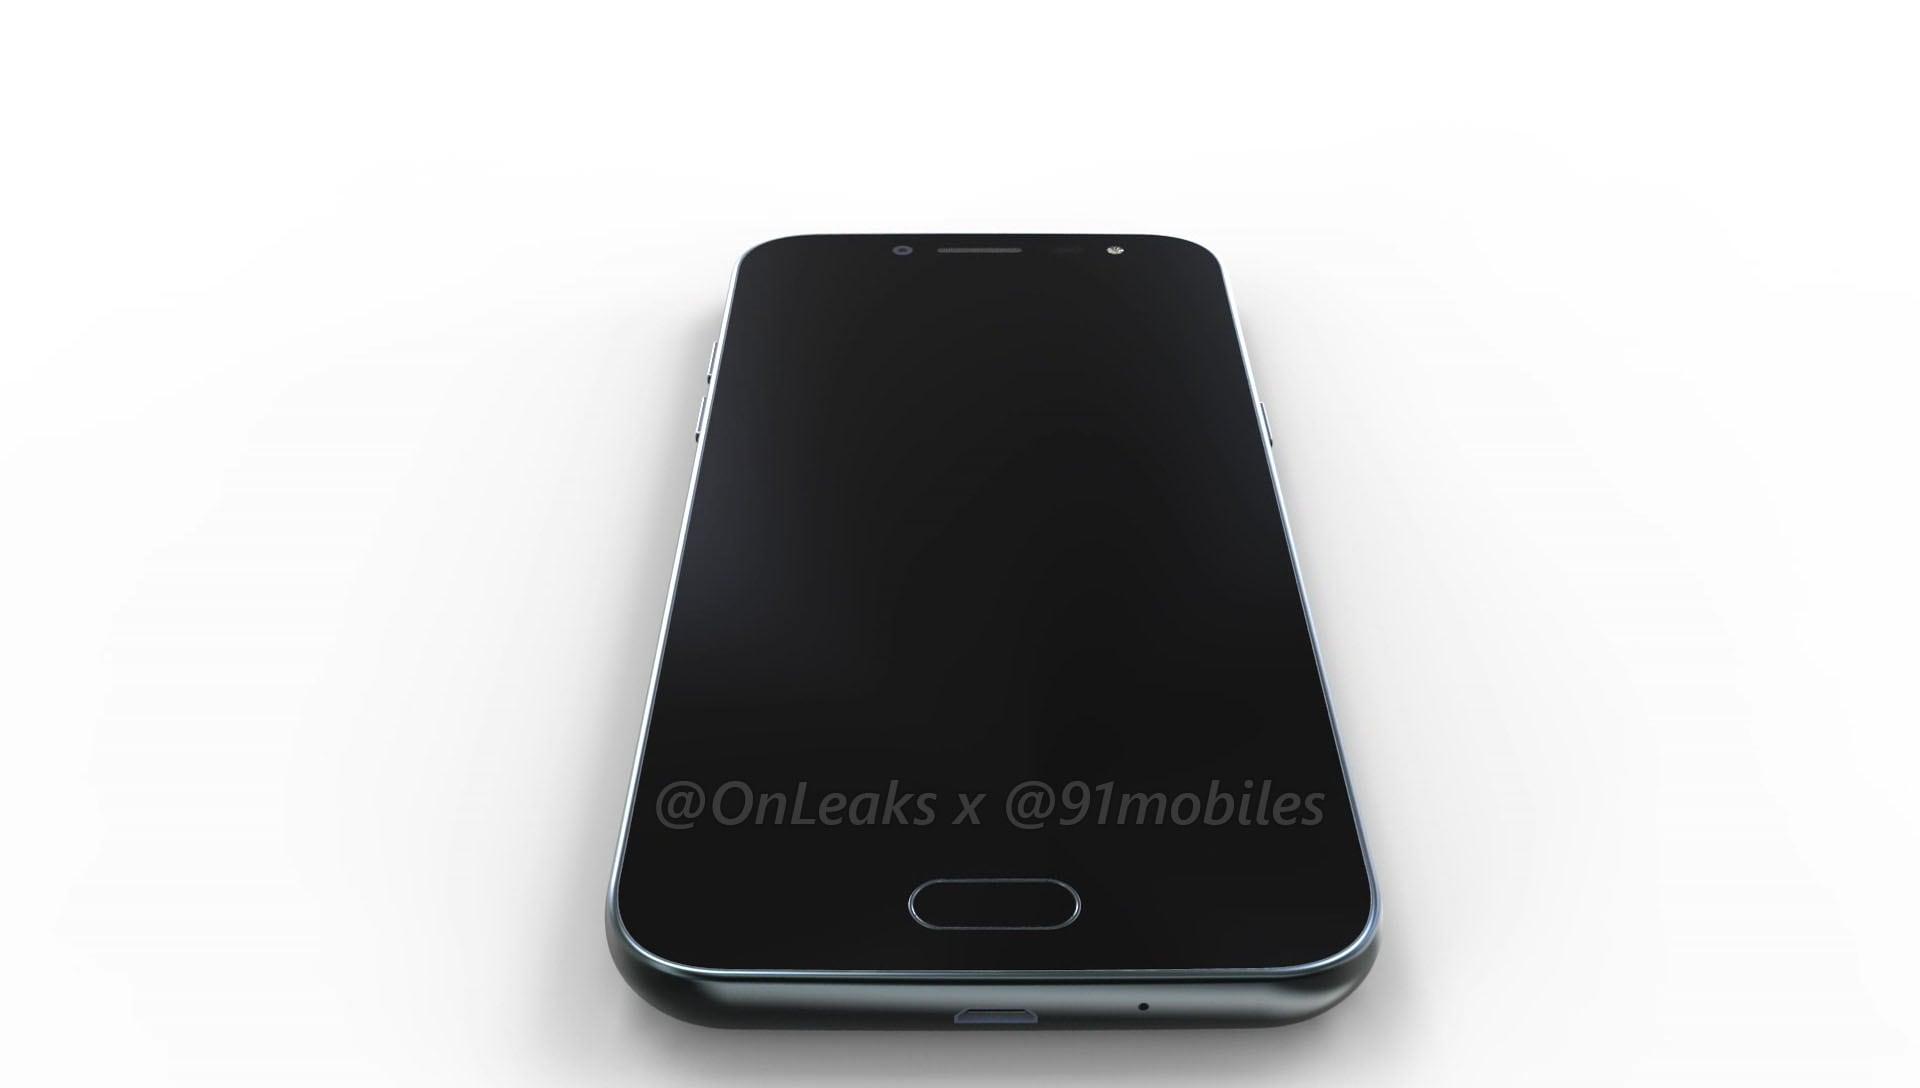 Samsung-Galaxy-J2-Pro-2018-render-leak-2